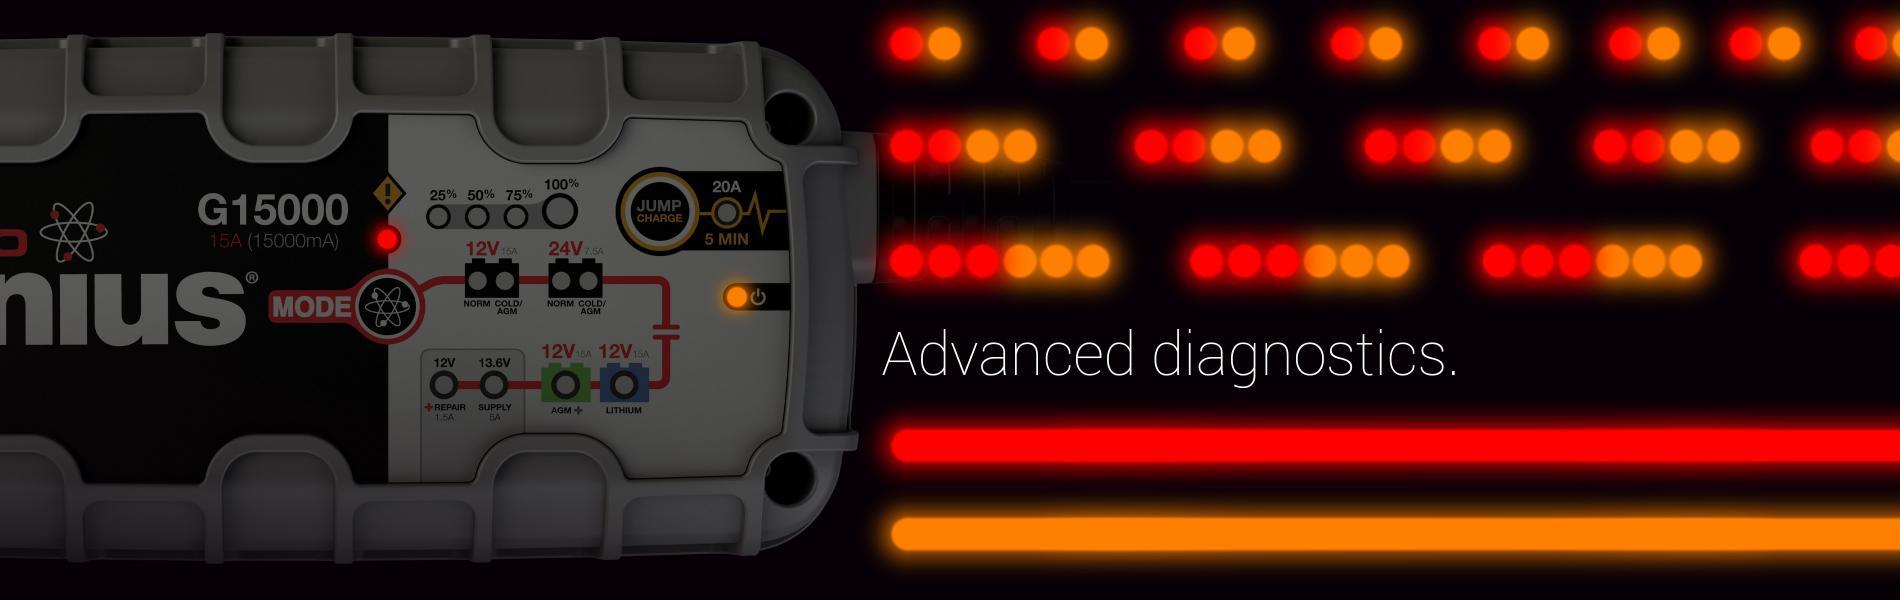 g15000-12v-24v-portable-automotive-car-battery-charger-maintainer-advanced-diagnostics.jpg